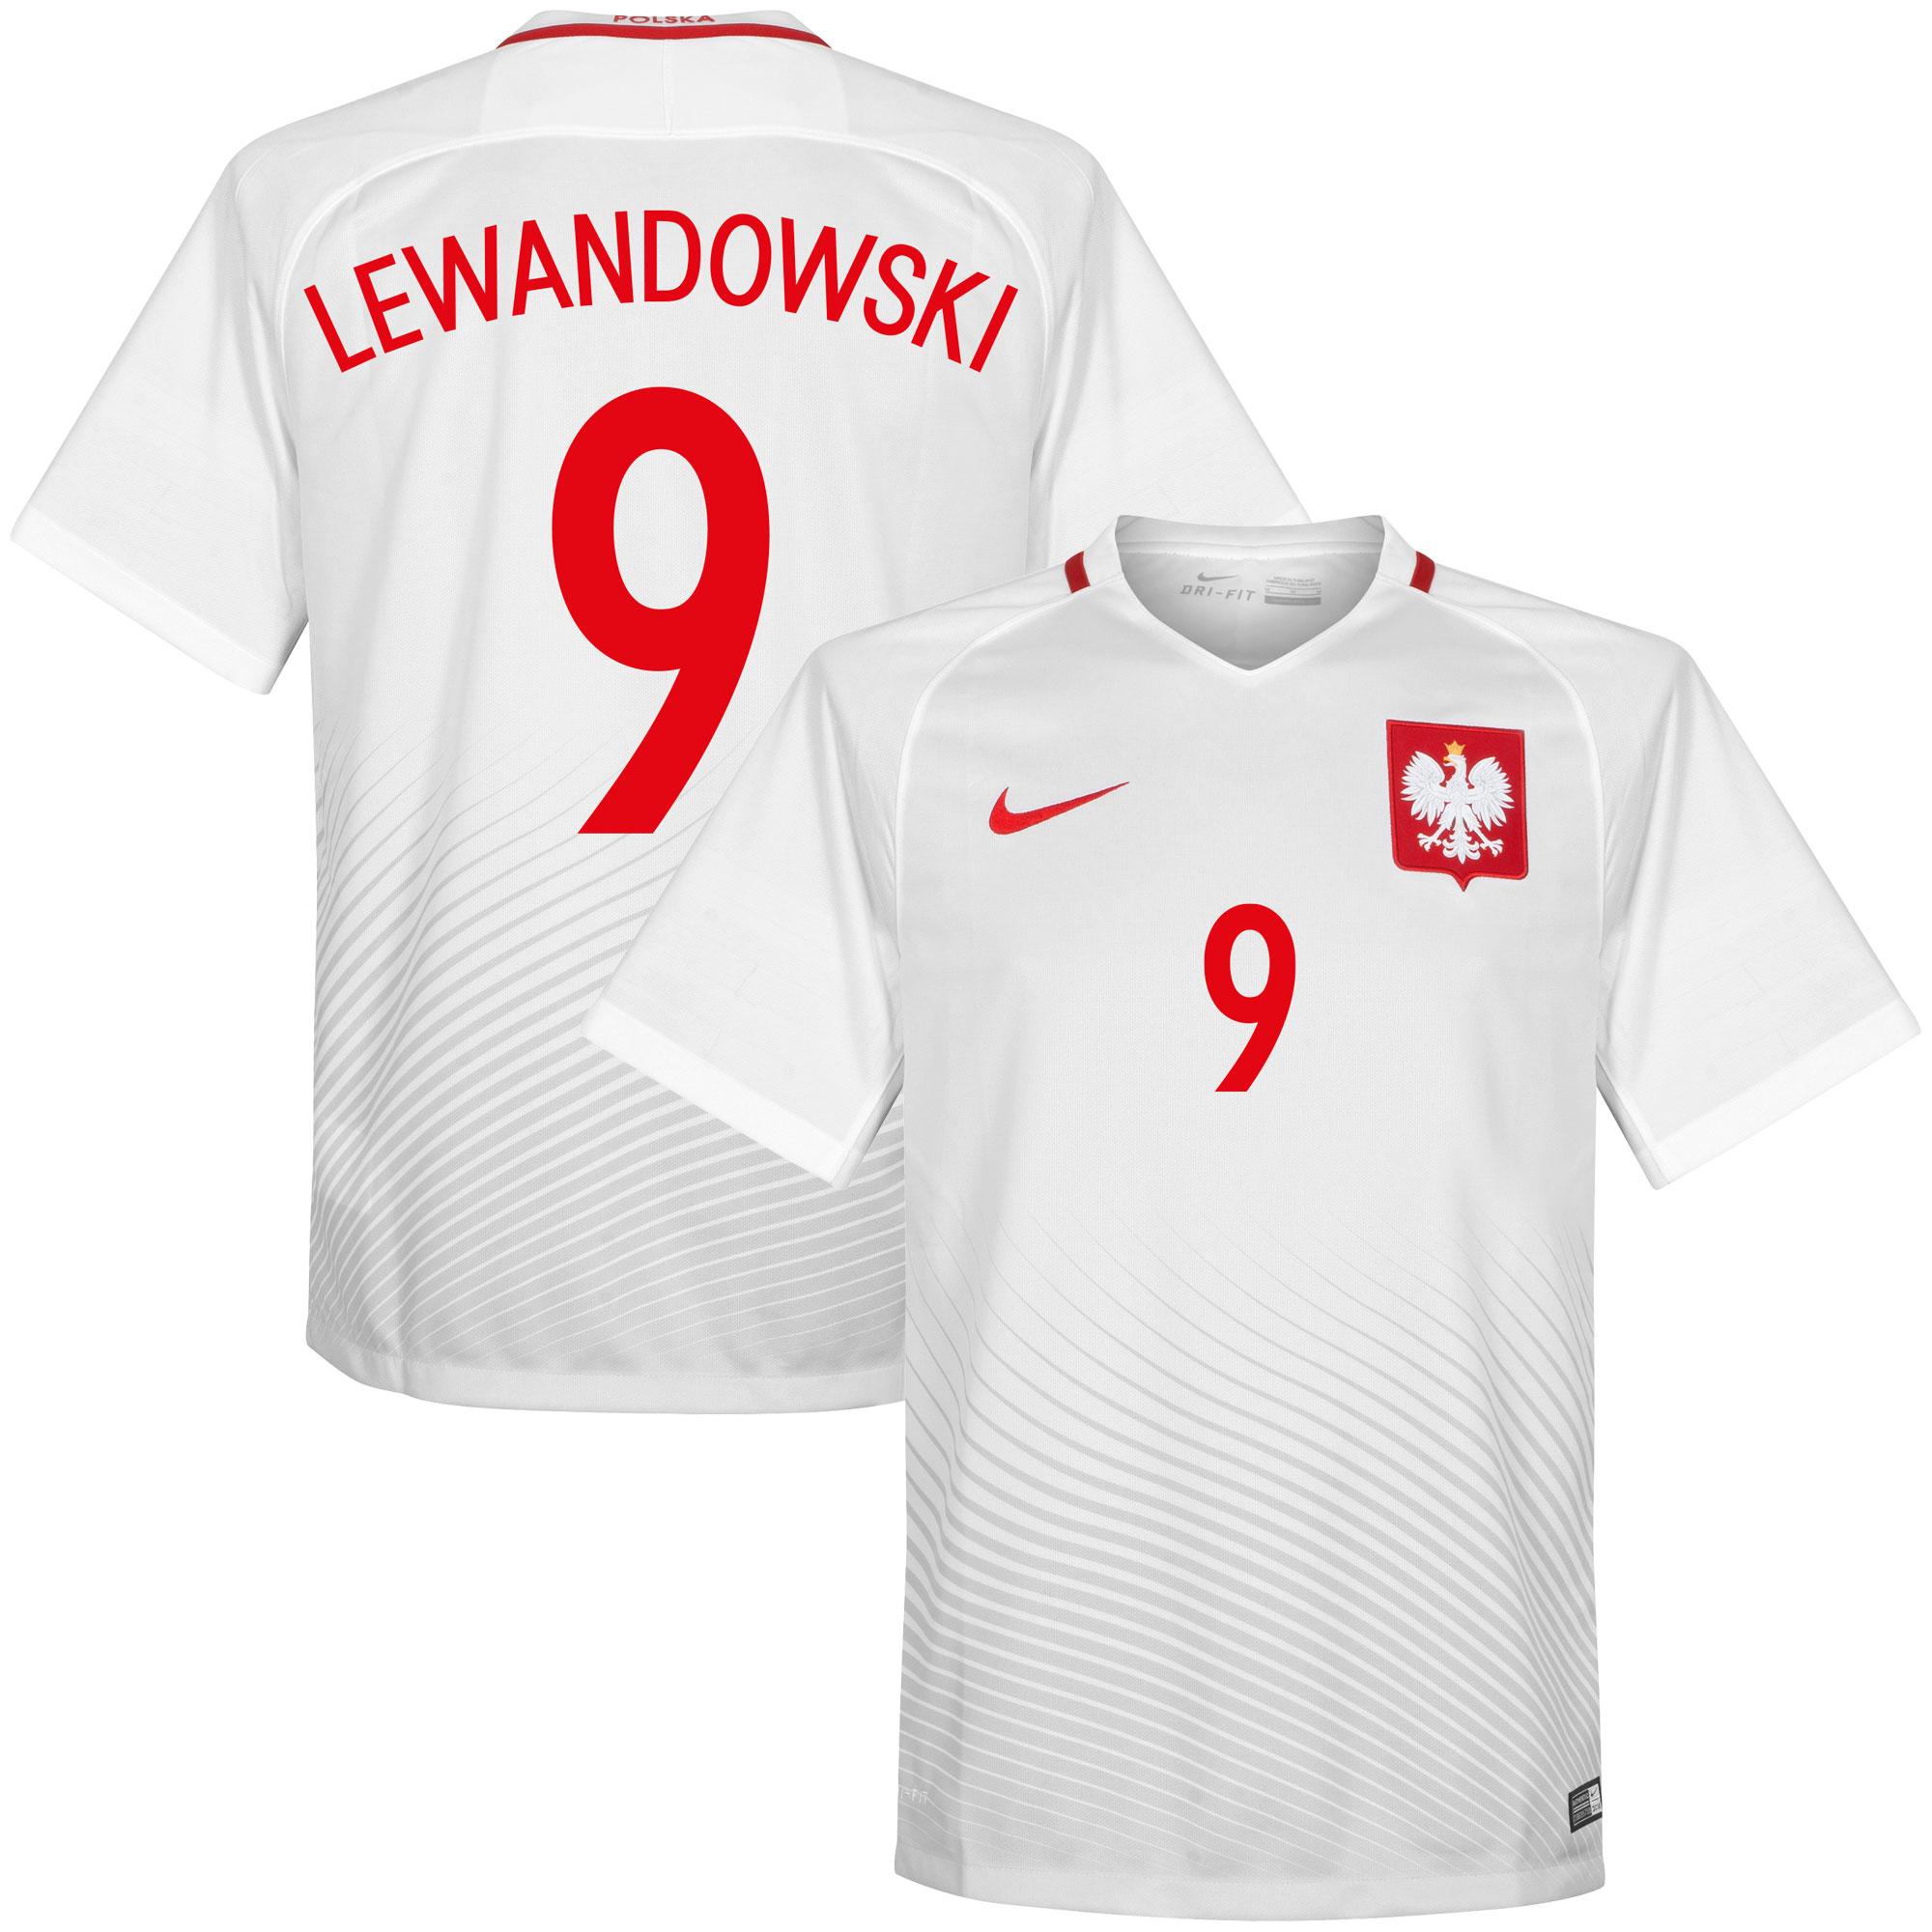 Poland Home Lewandowski Jersey 2016 / 2017 (Fan Style Printing) - XXL